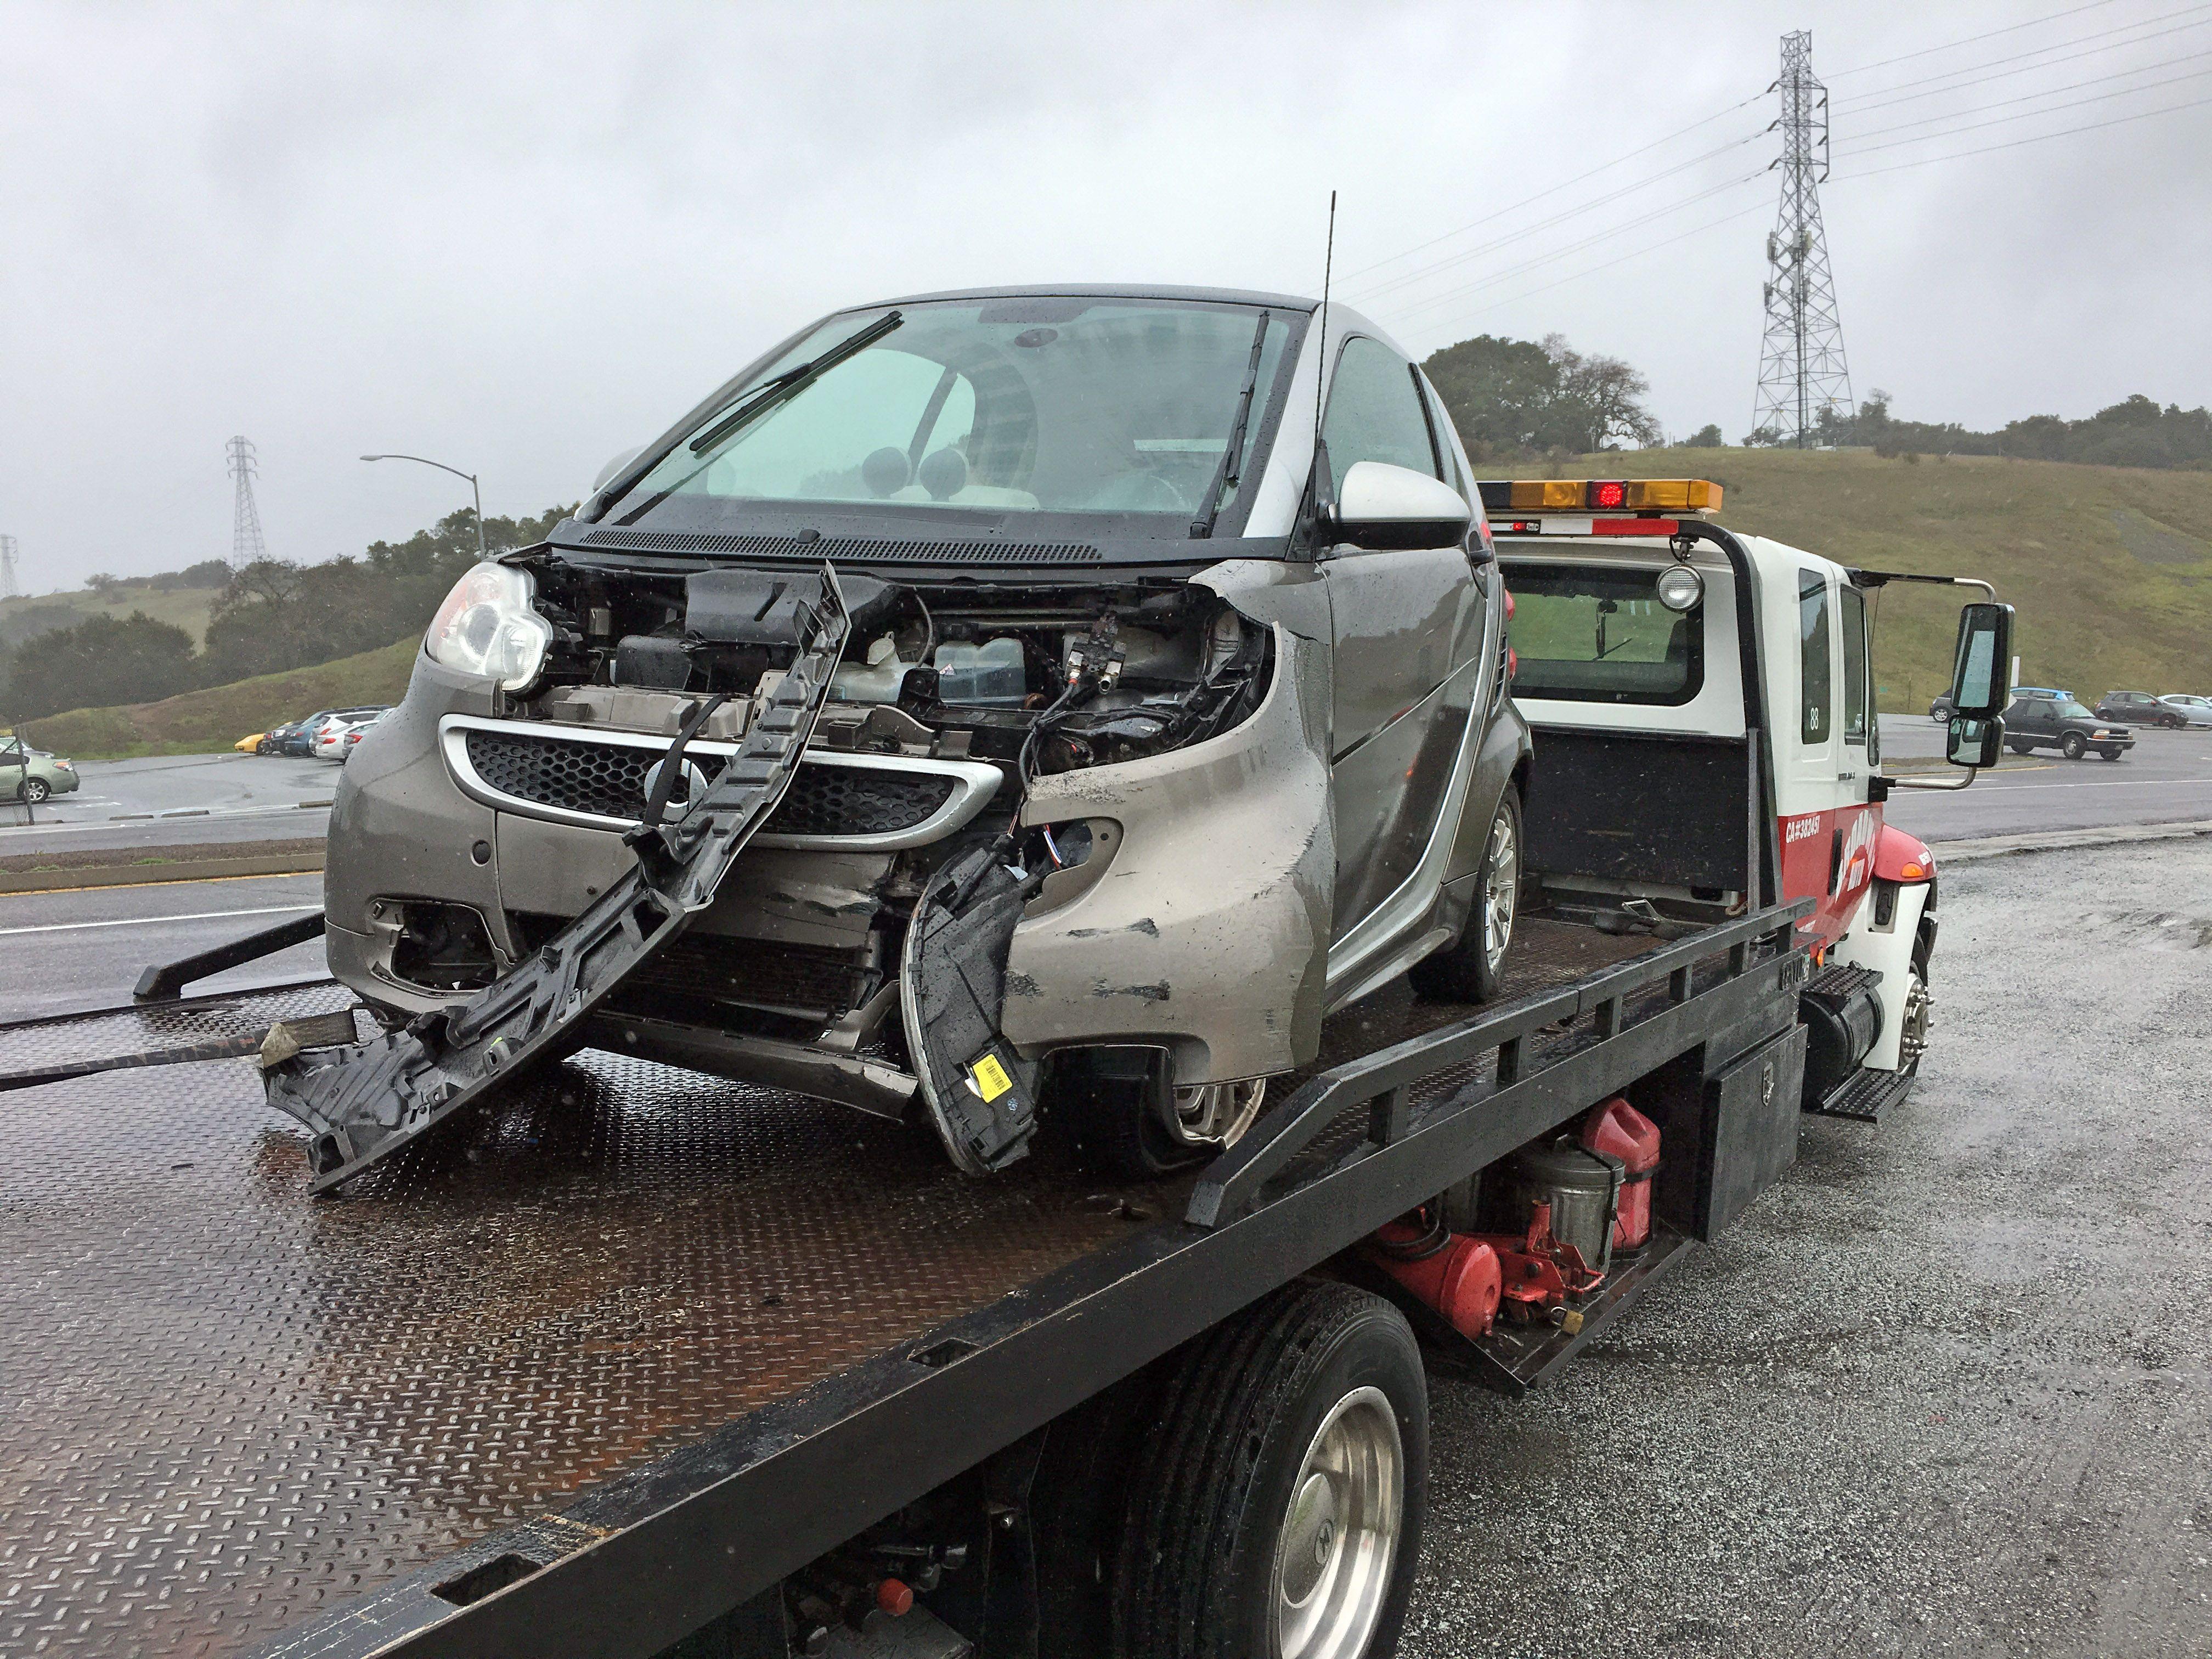 Cash for Junk Cars Broward County FL. Broward county